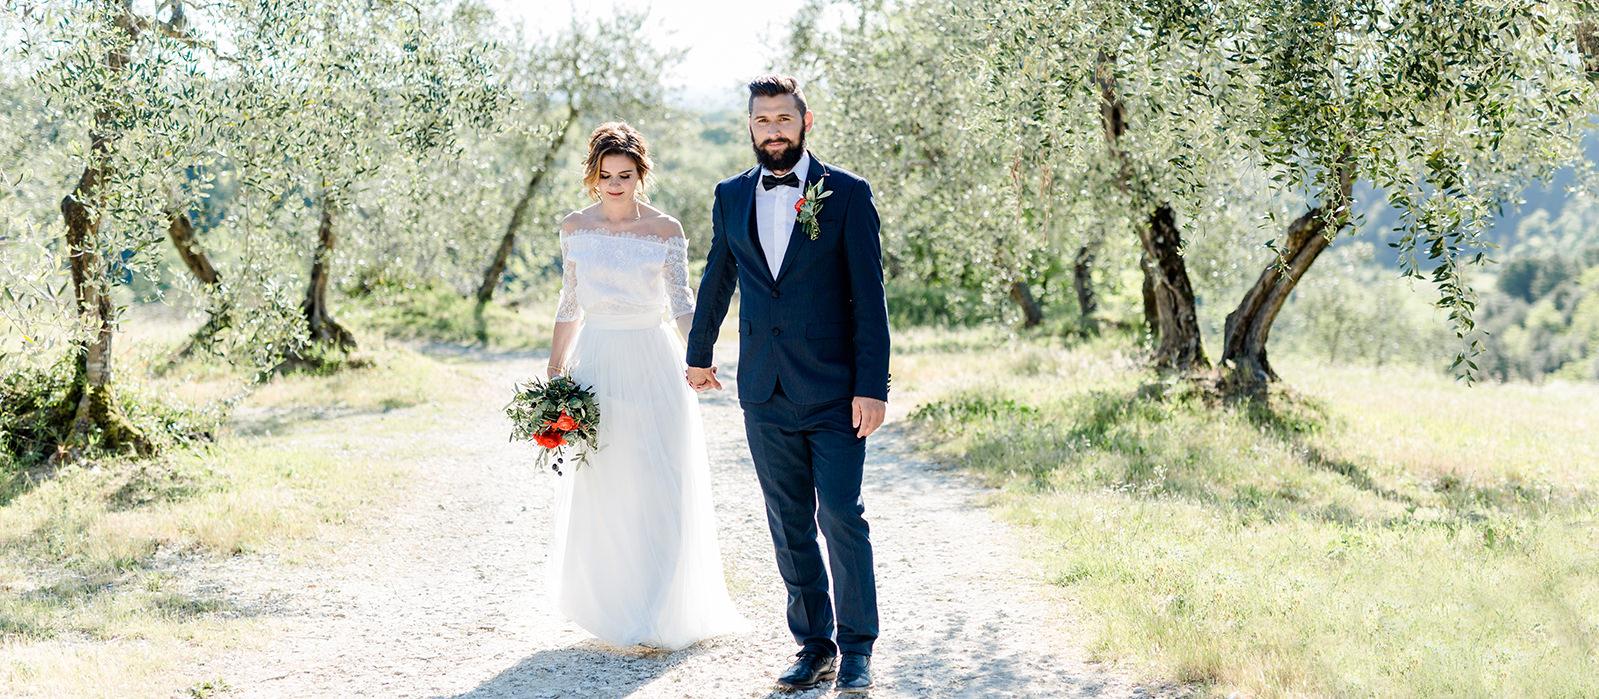 Hochzeit Toskana